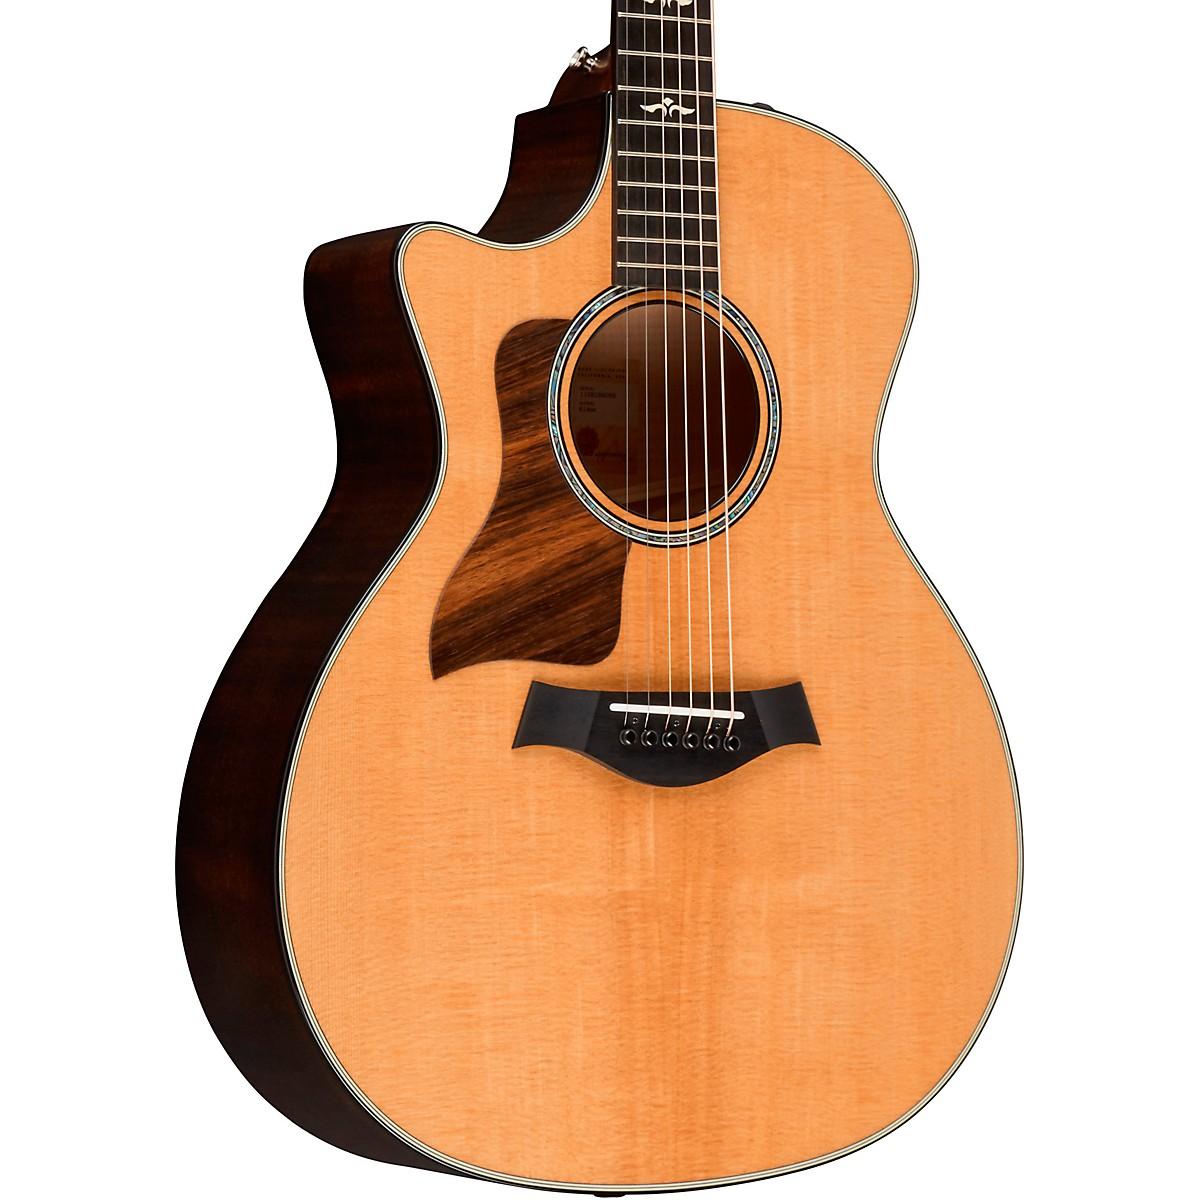 Taylor 614ce-LH V-Class Left-Handed Grand Auditorium Acoustic-Electric Guitar